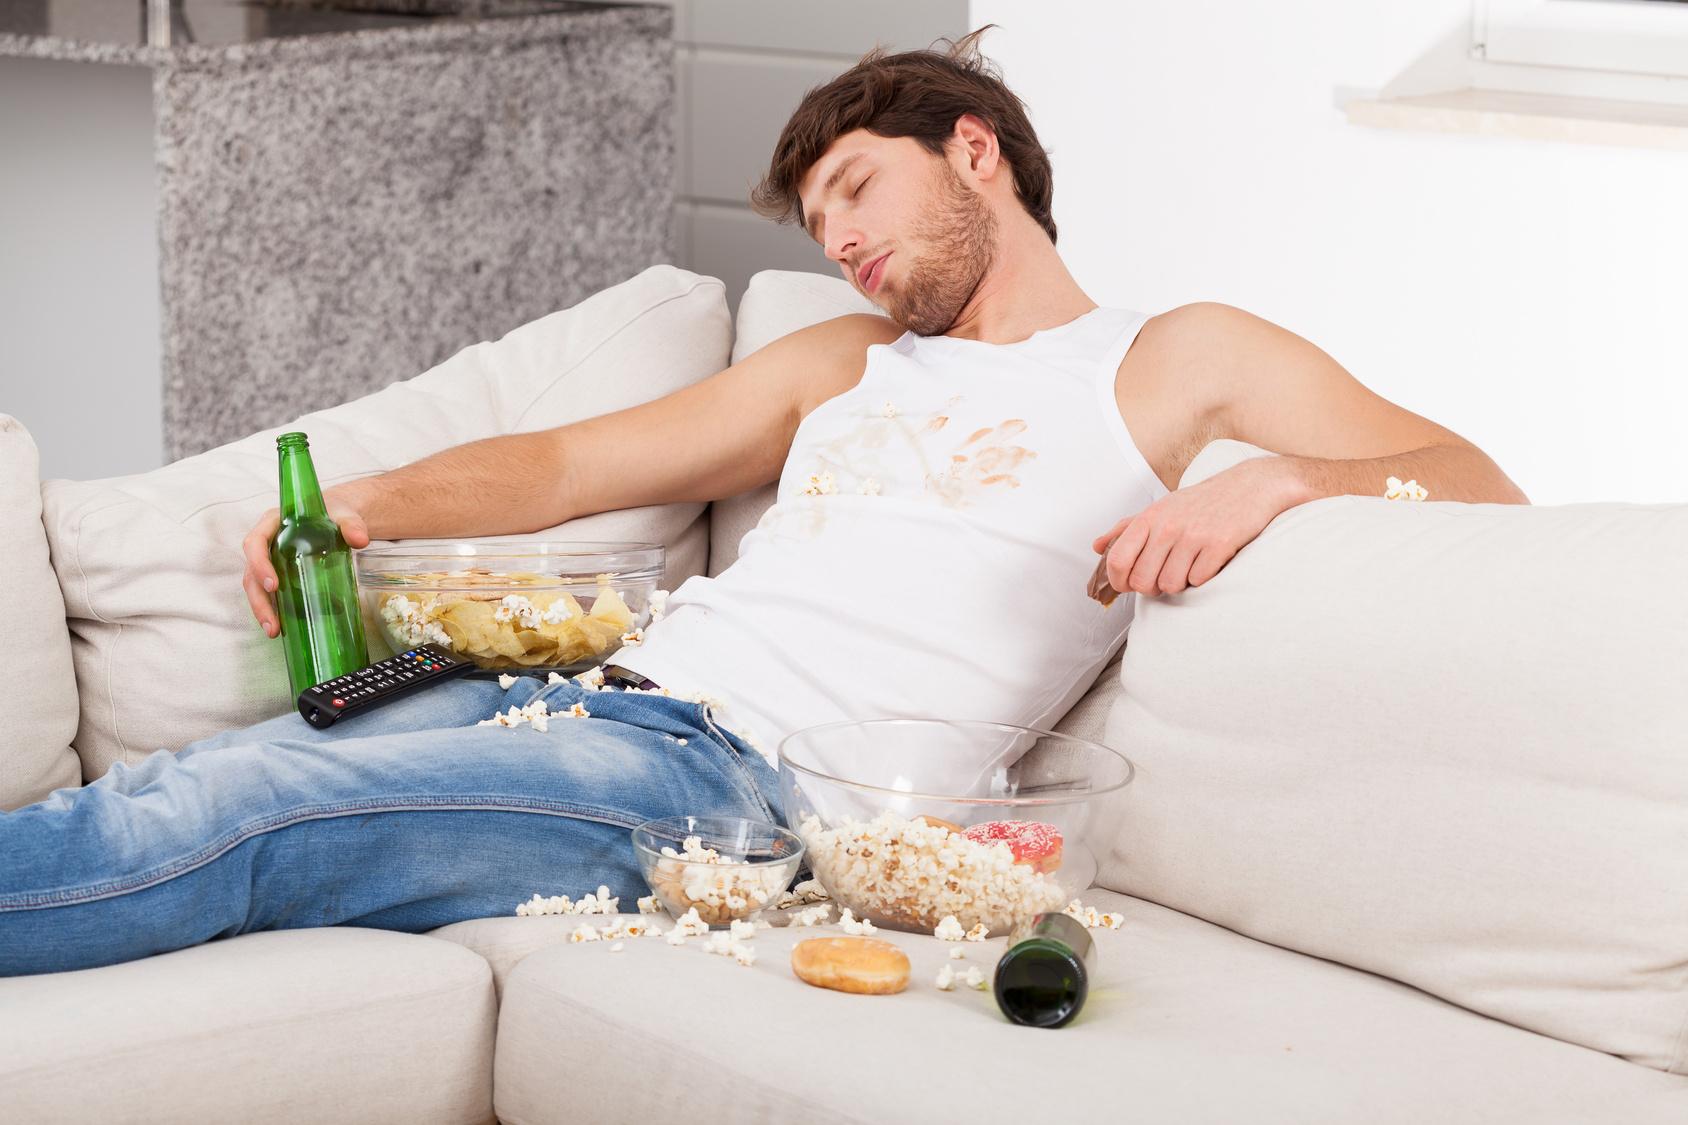 Fettfleck Auf Sofa wie du hartnäckige flecken auf dem sofa entfernst